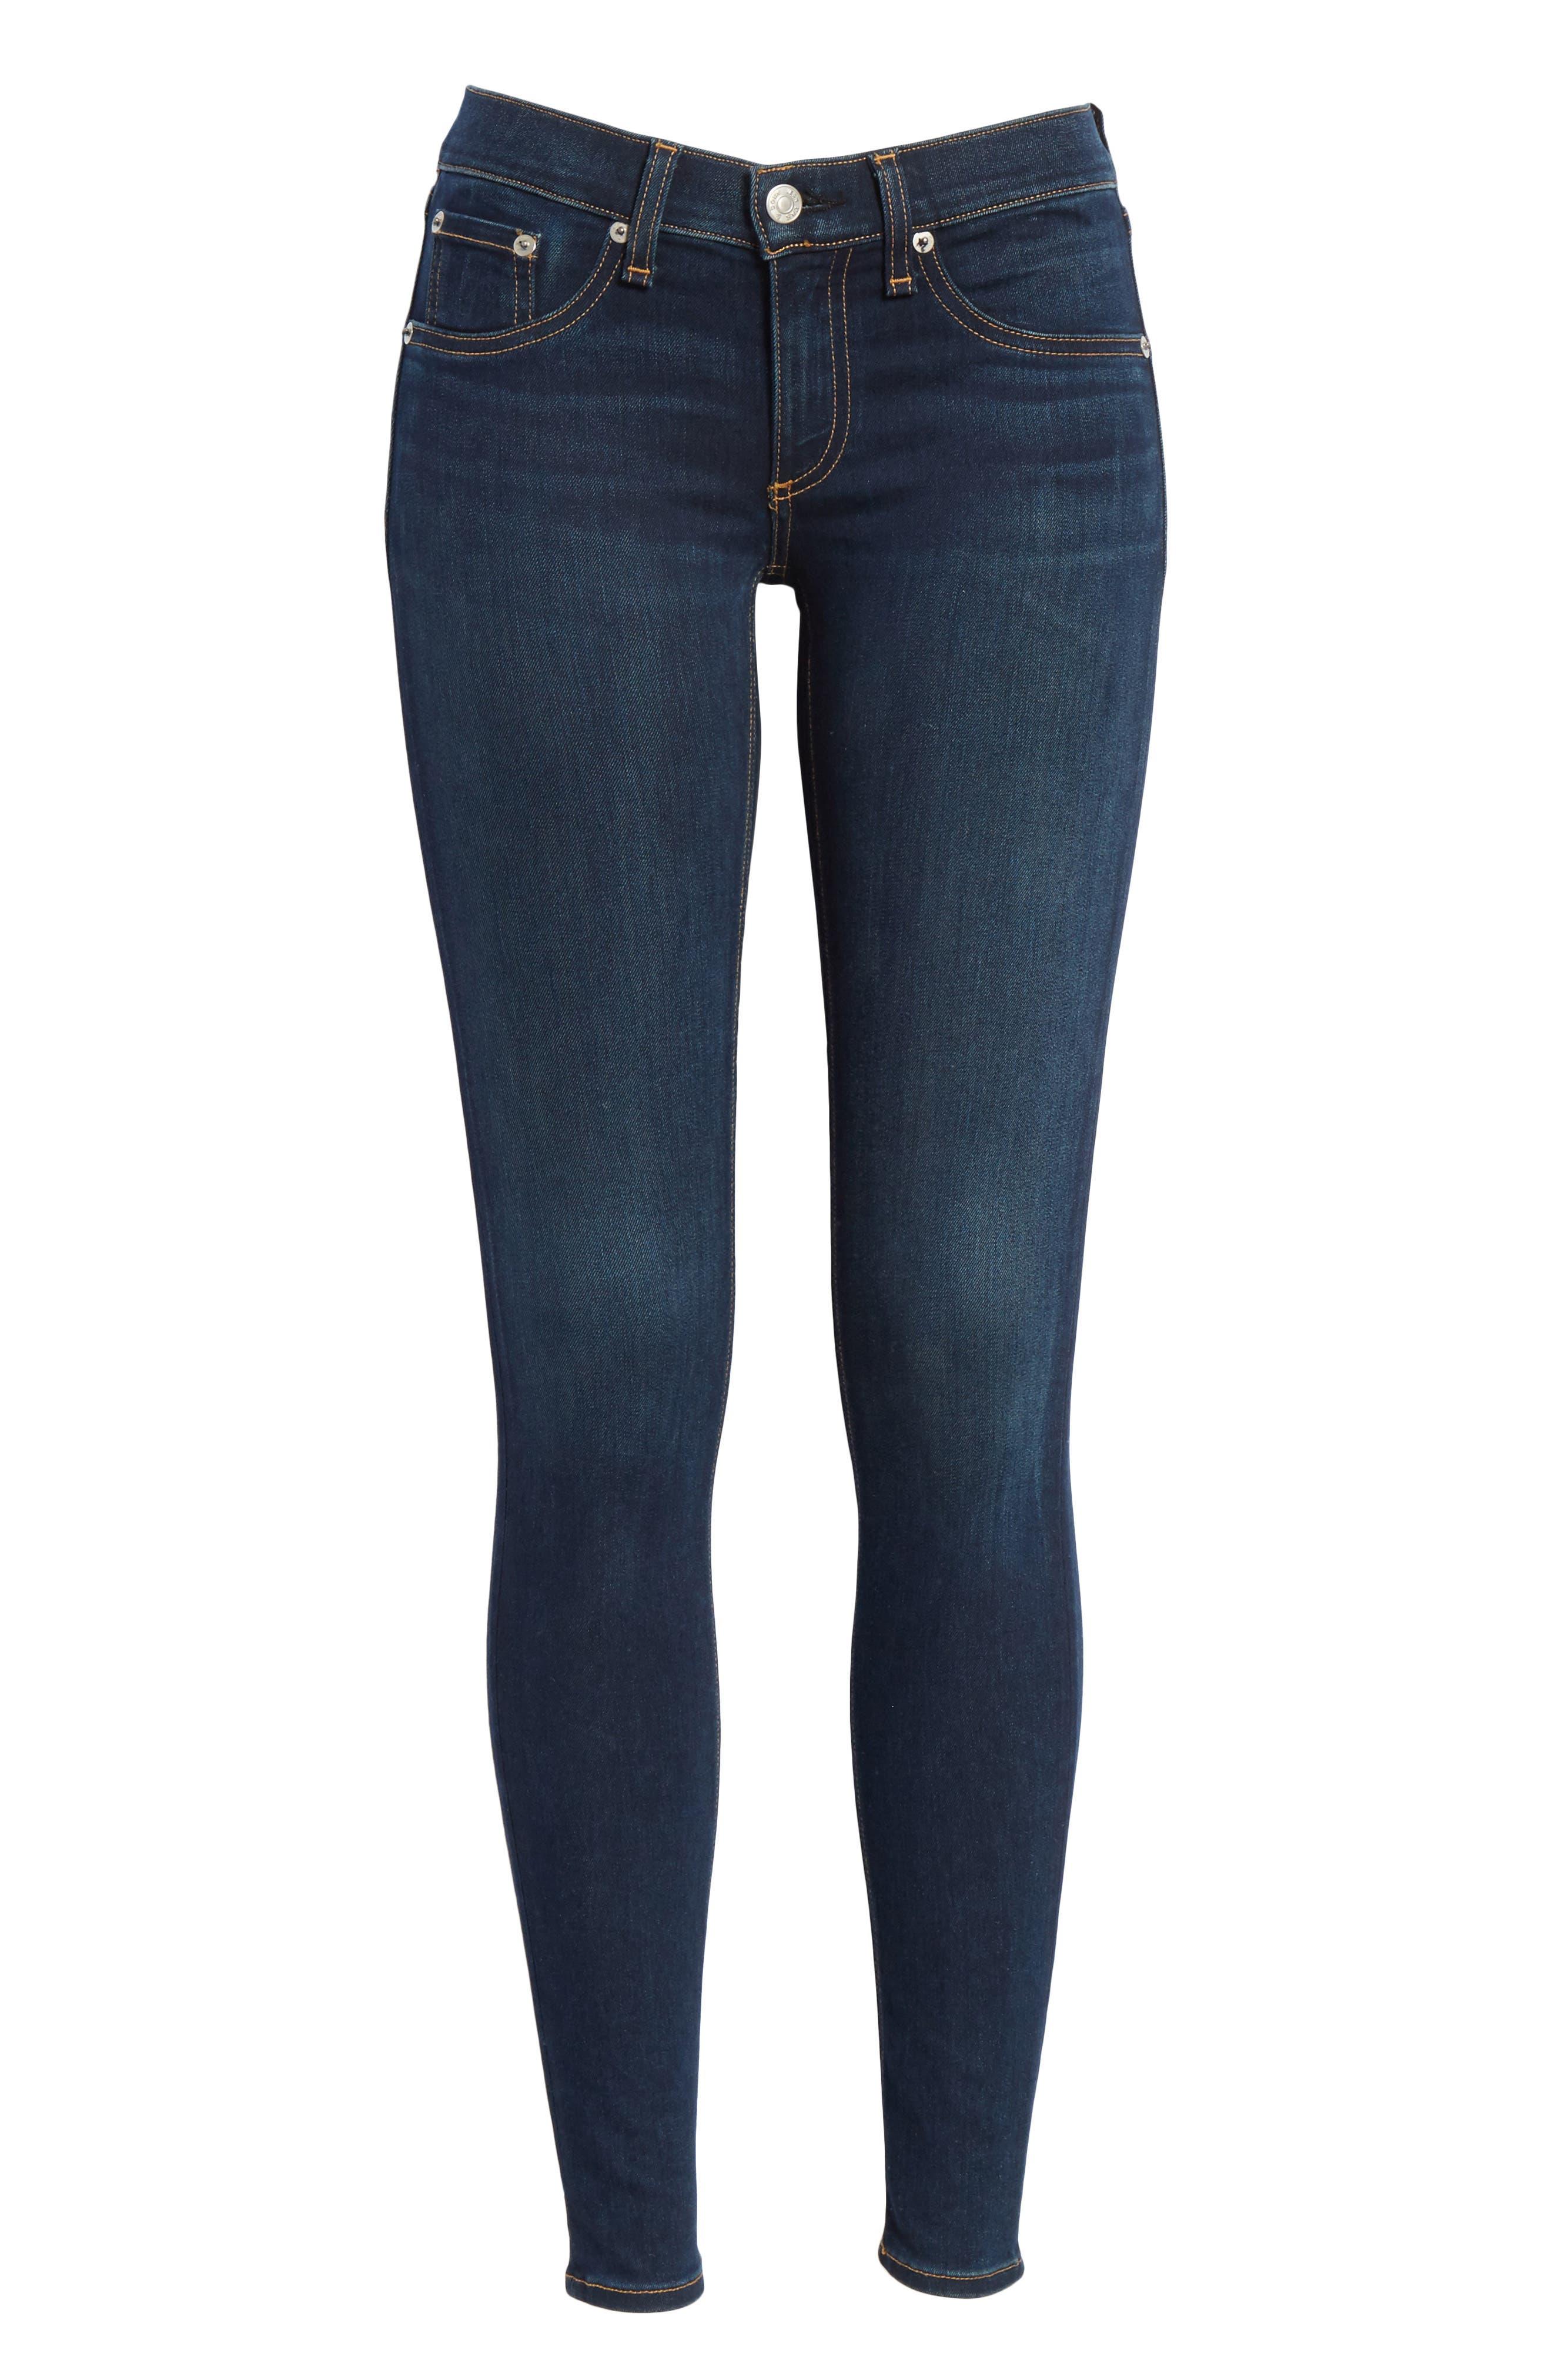 RAG & BONE, Skinny Stretch Jeans, Alternate thumbnail 8, color, BEDFORD